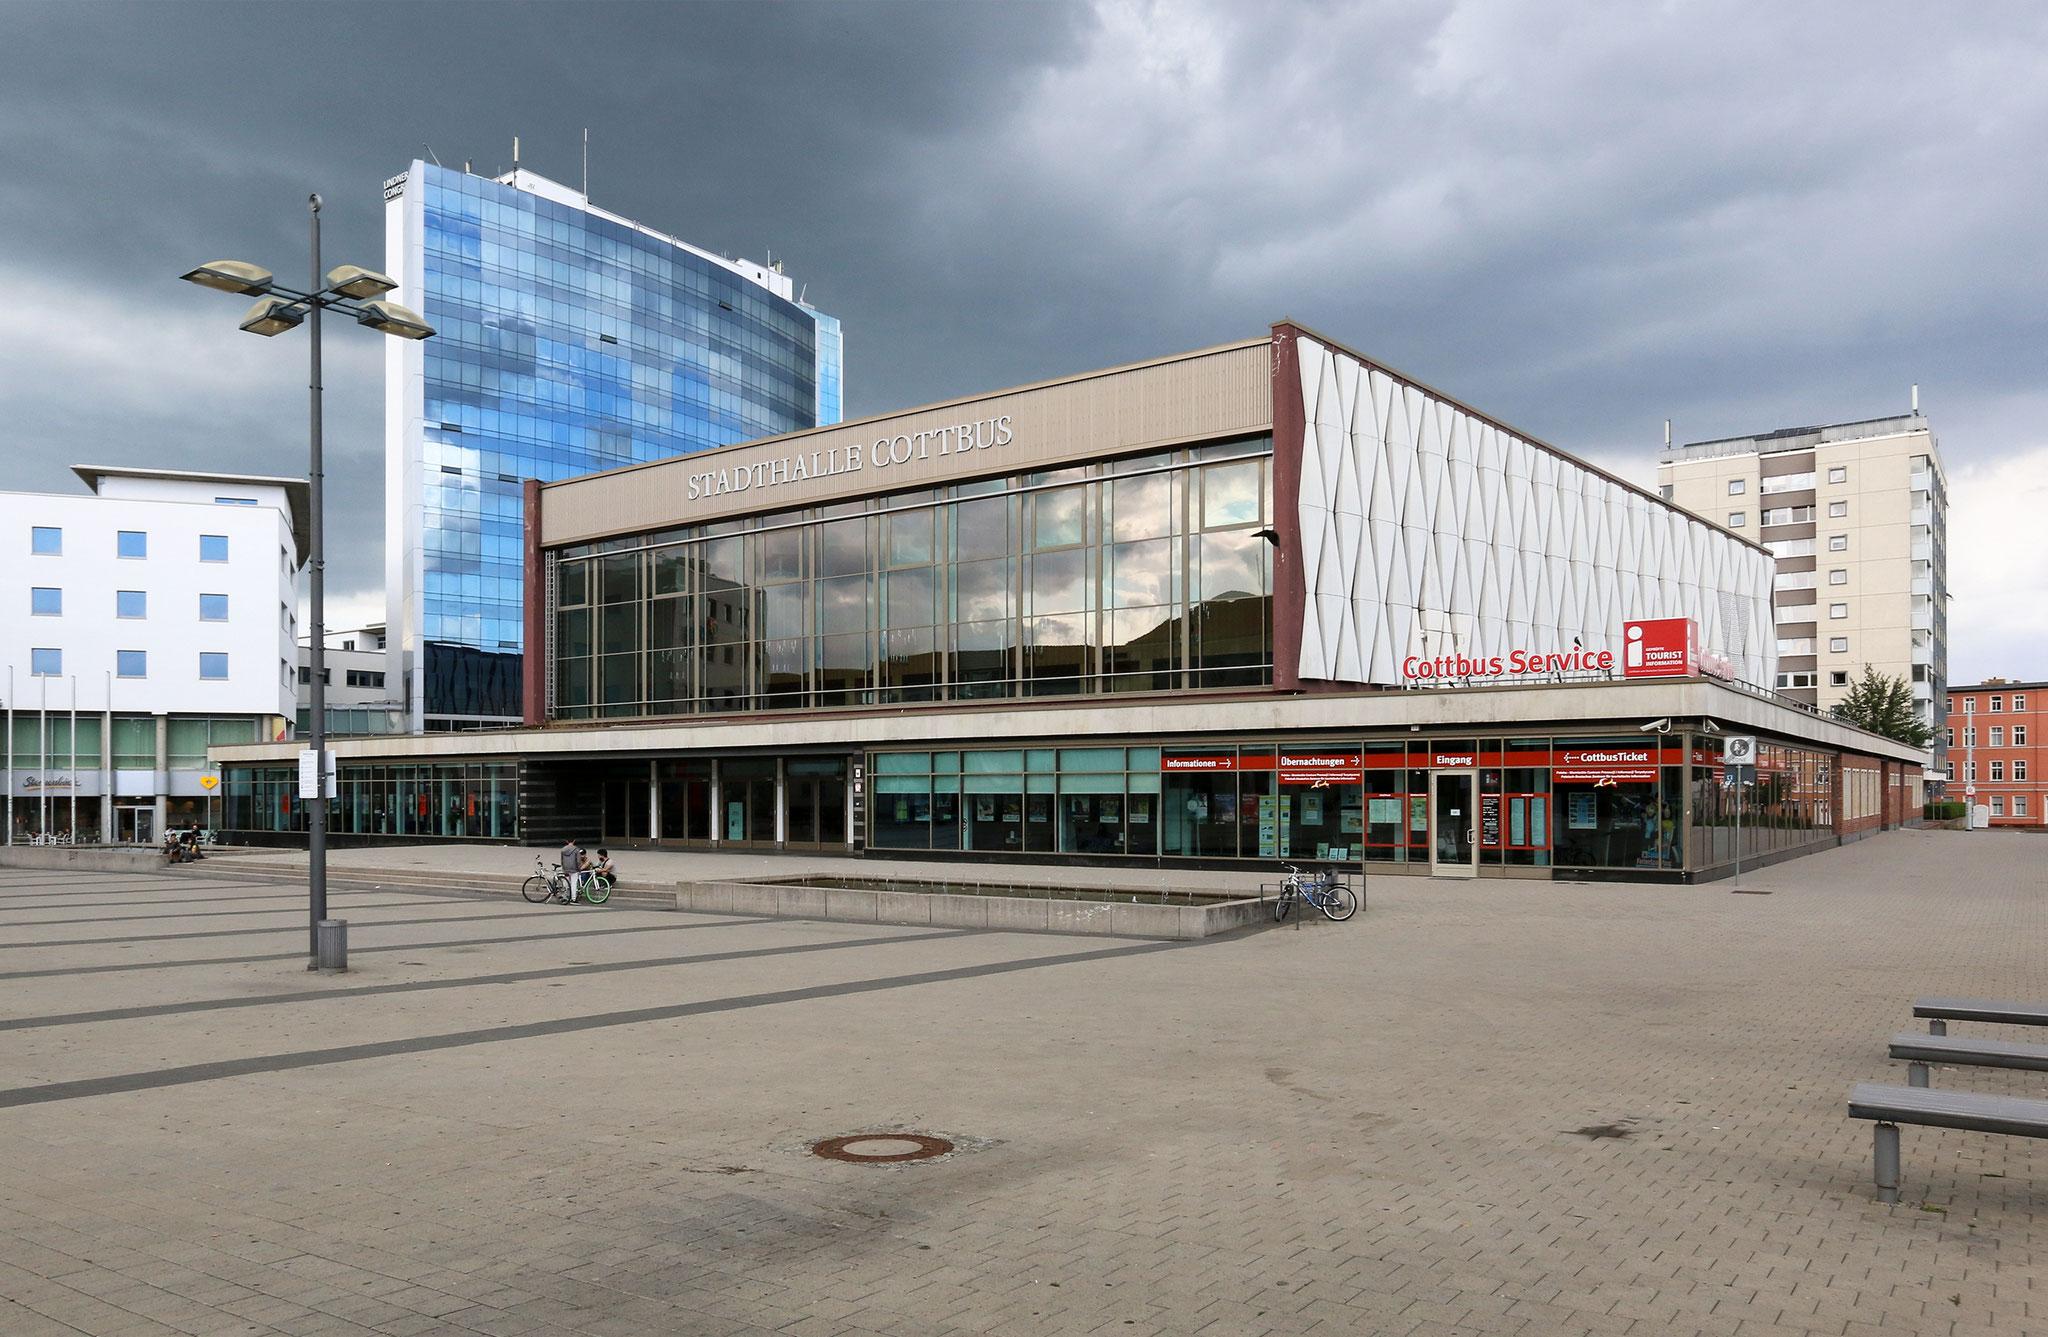 Stadthalle Cottbus (1975)